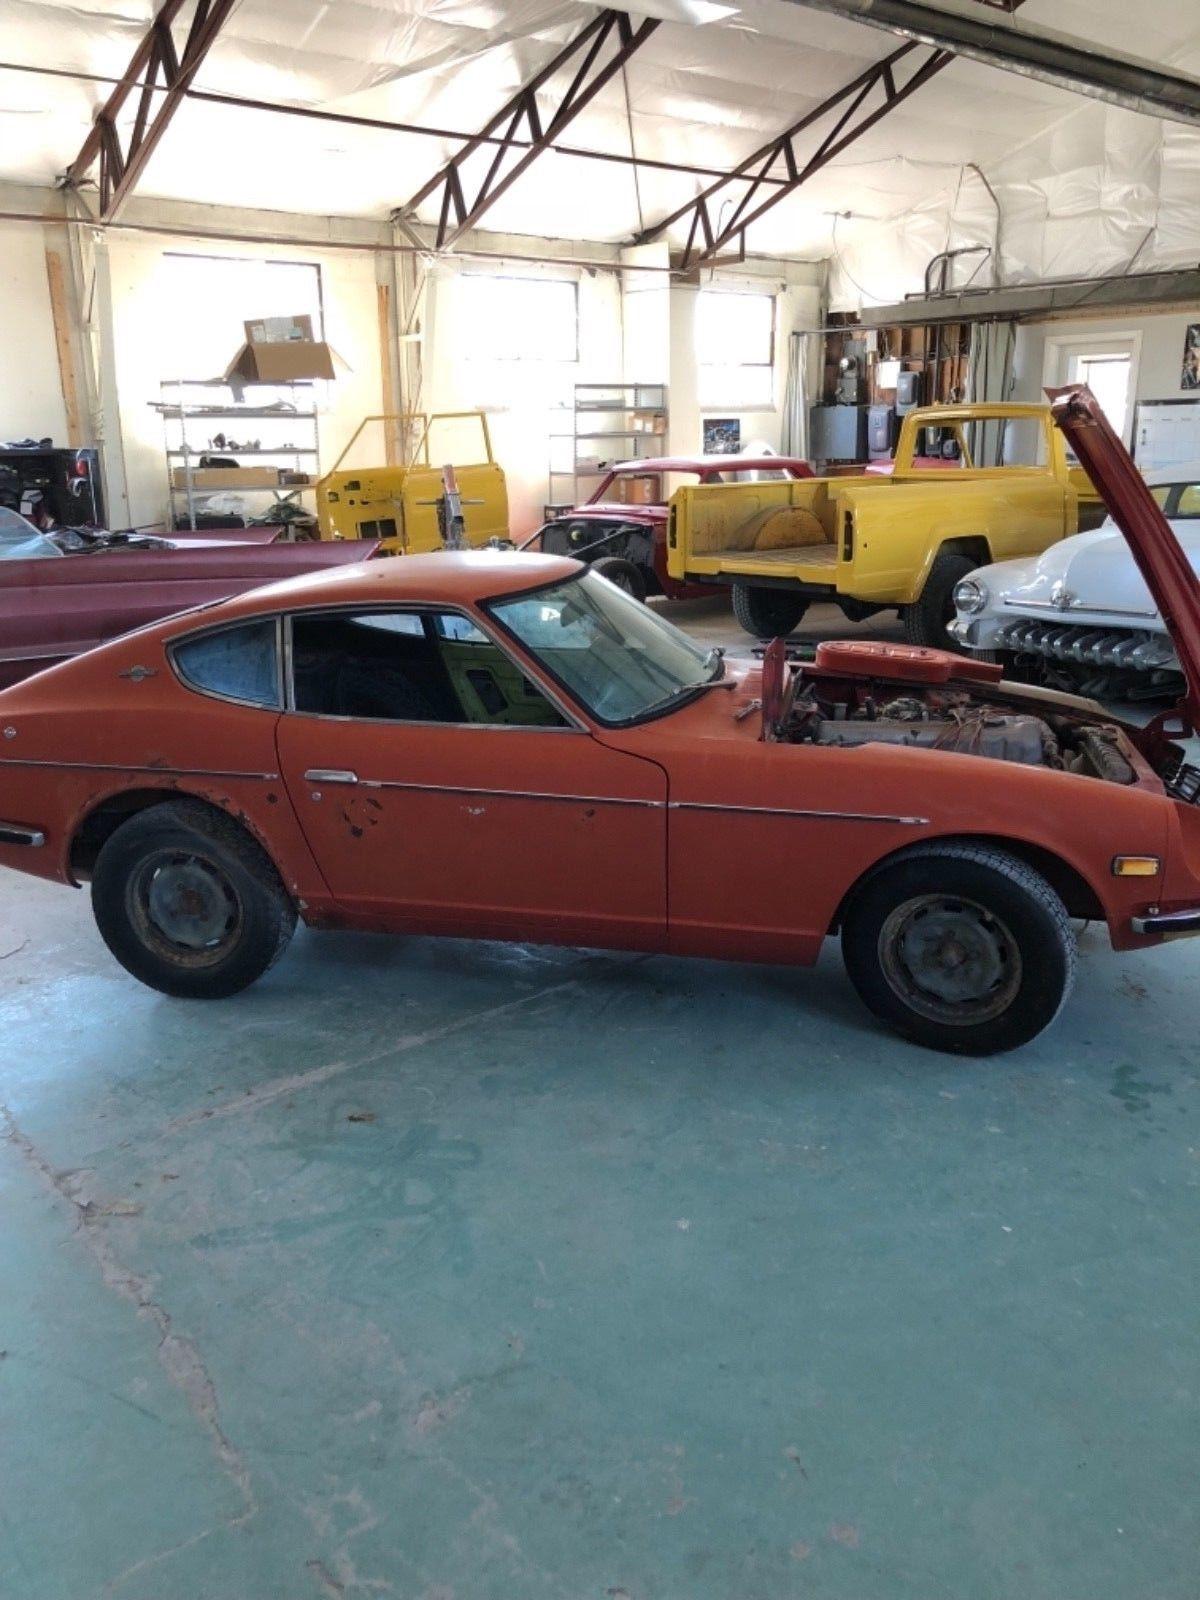 NICE 1970 Datsun Z Series Datsun, Salvage cars, Cars for